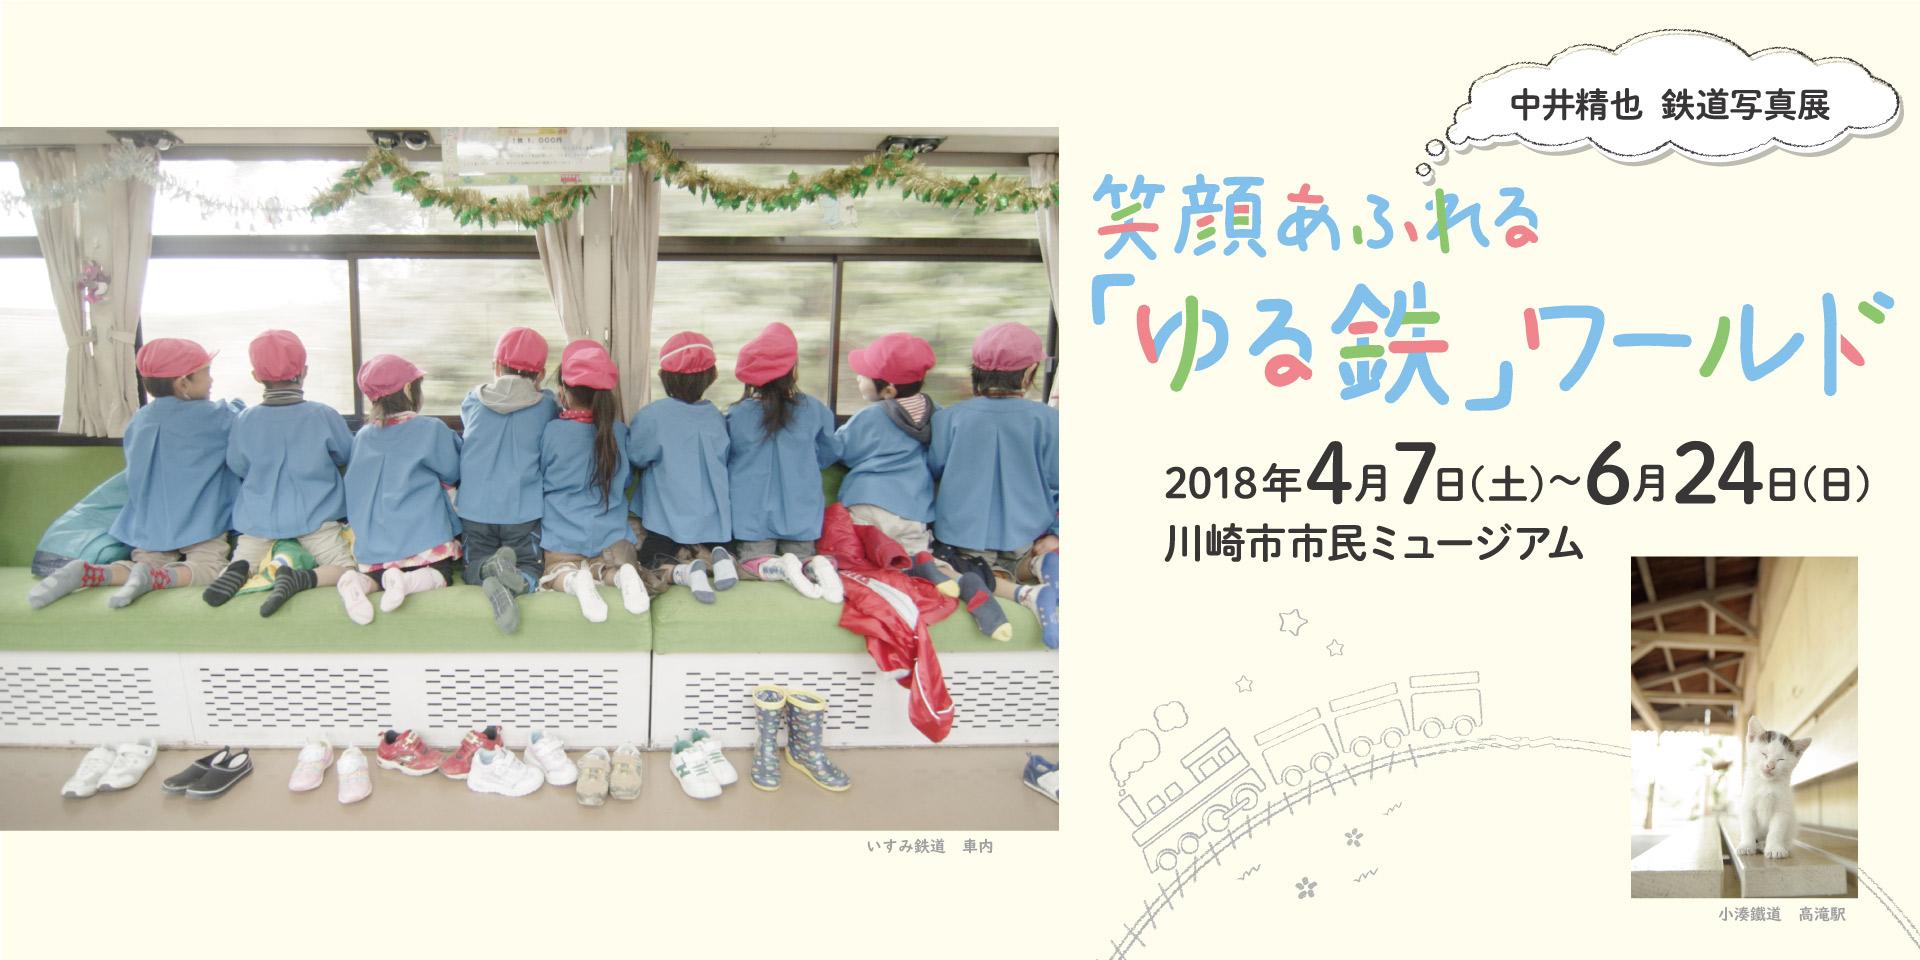 f:id:tetsuya0723:20180407191314j:plain